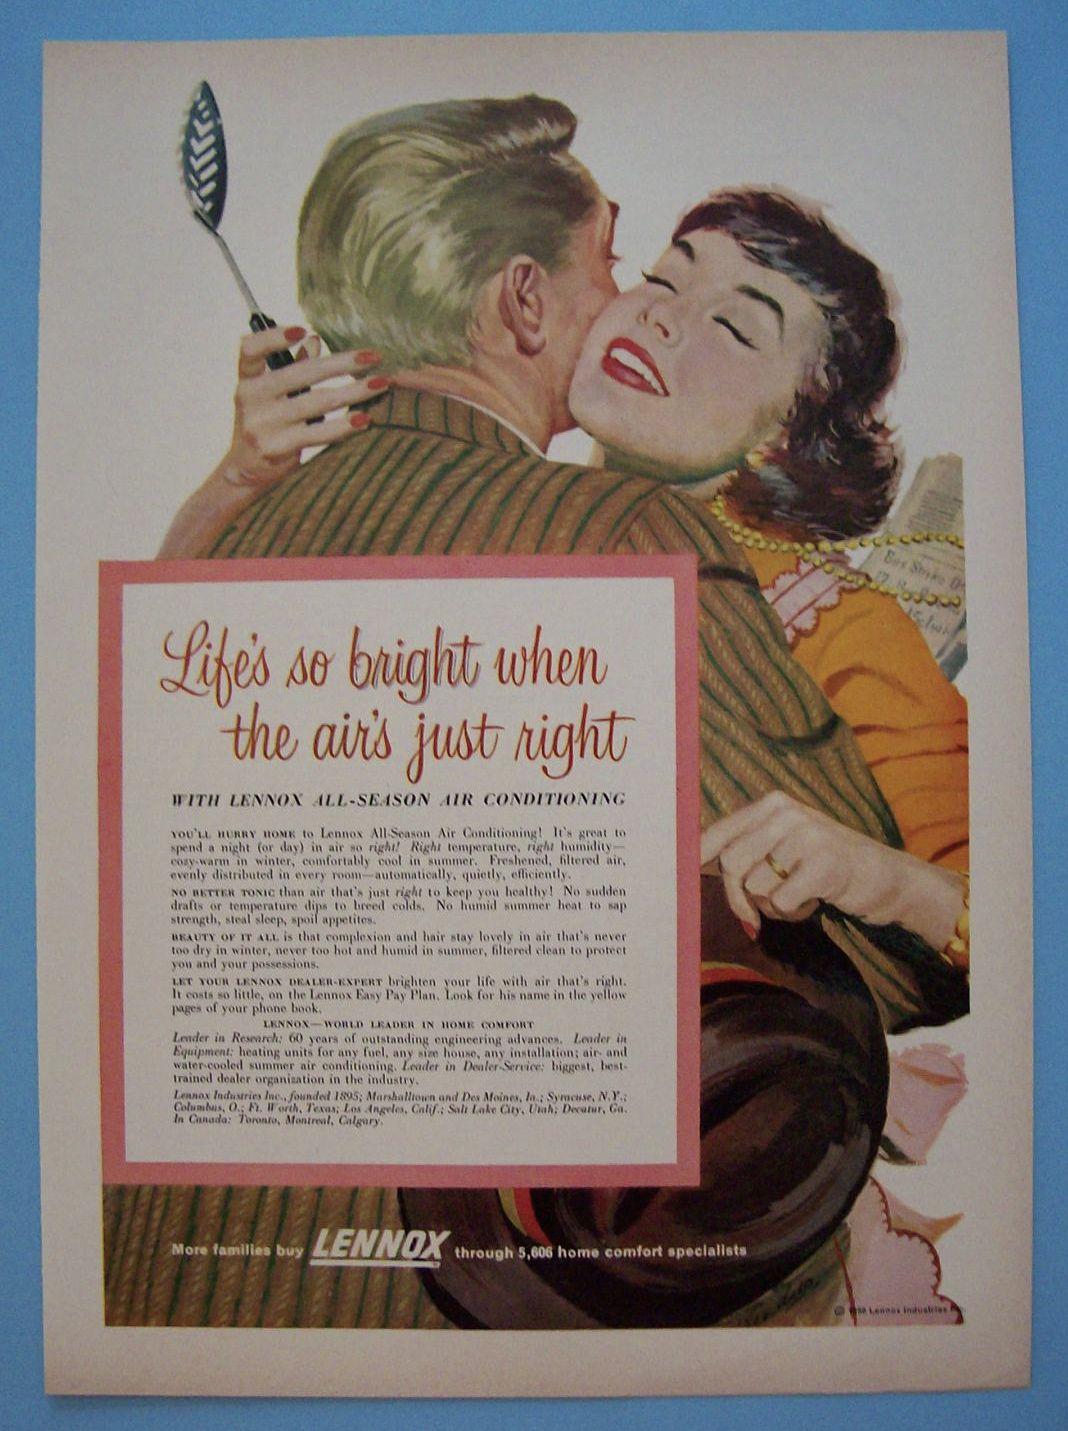 Vintage Ad 1956 Lennox AllSeason Air Conditioning